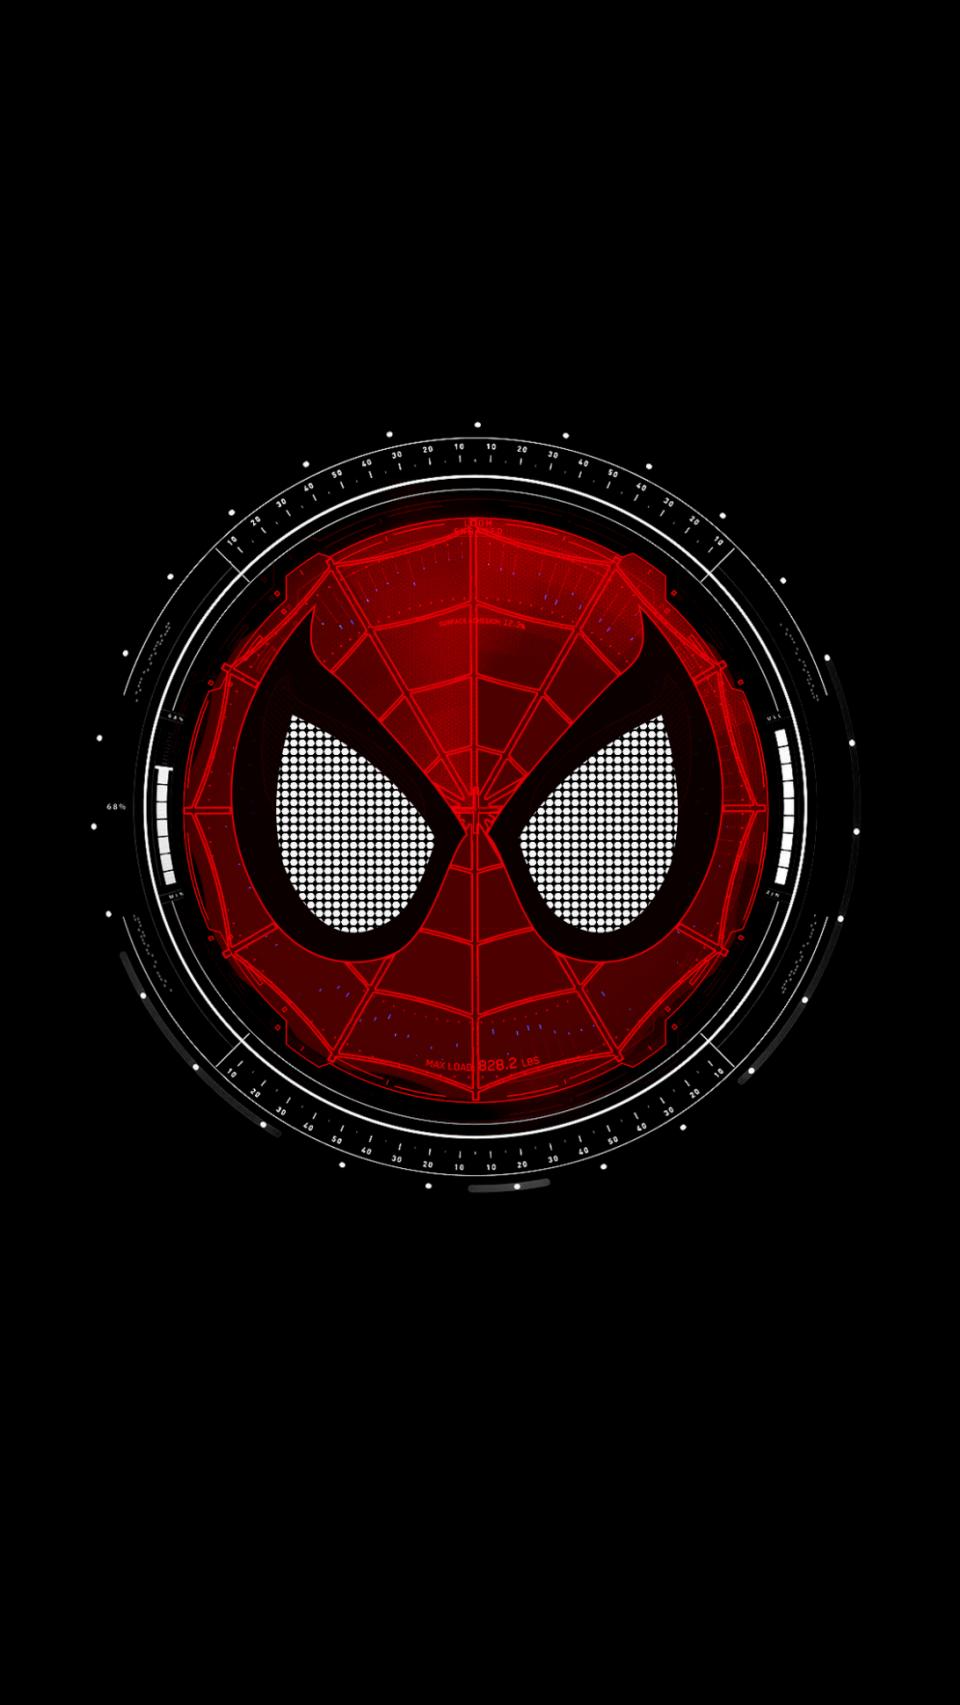 Spiderman Avengers Infinity War Iphone Wallpaper Marvel